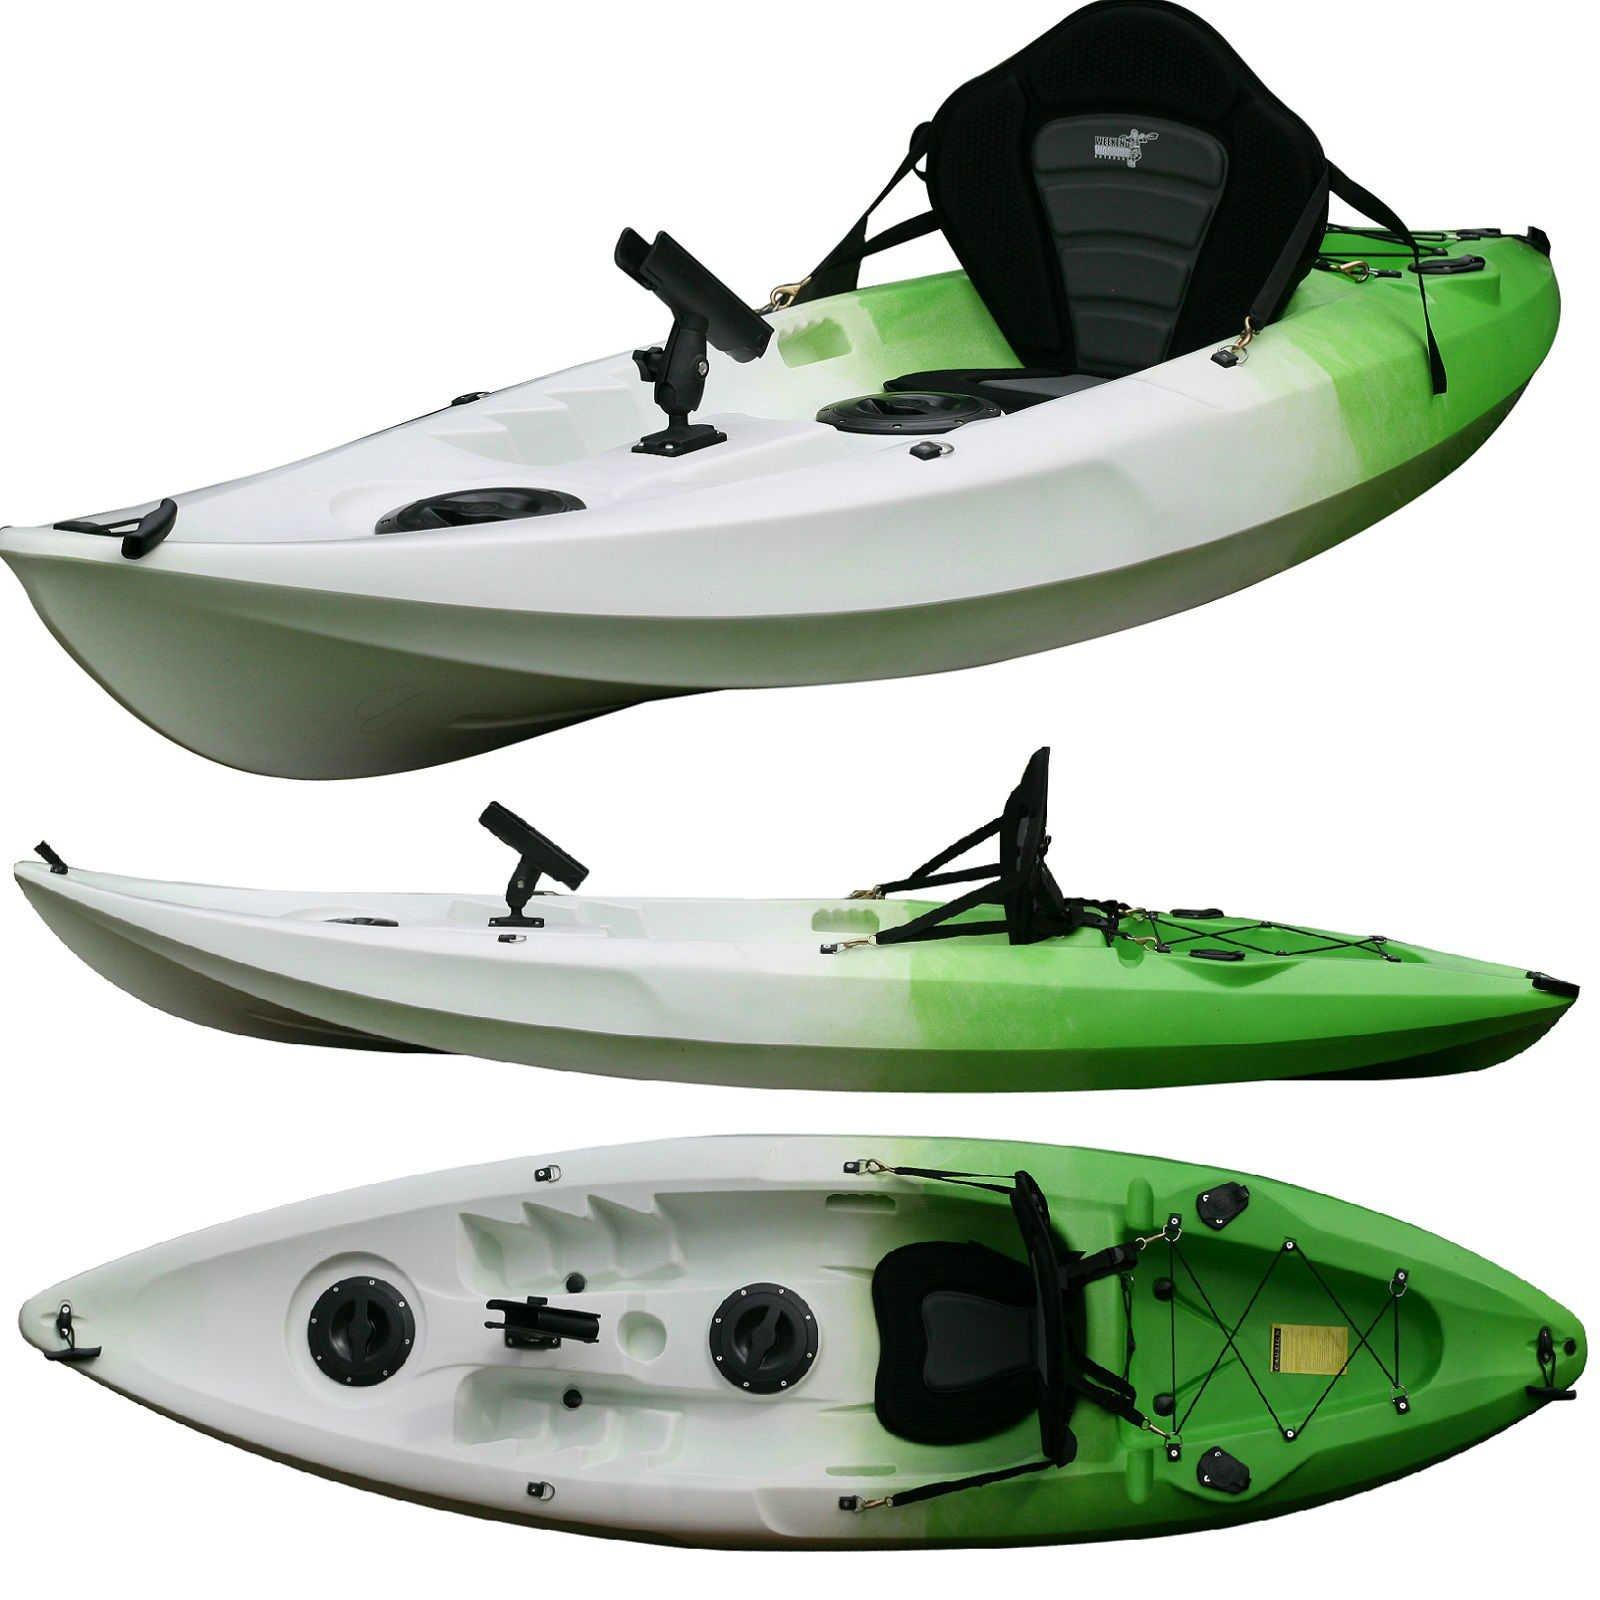 Single fishing kayak snapper green weekend warrior for Kayaks for fishing